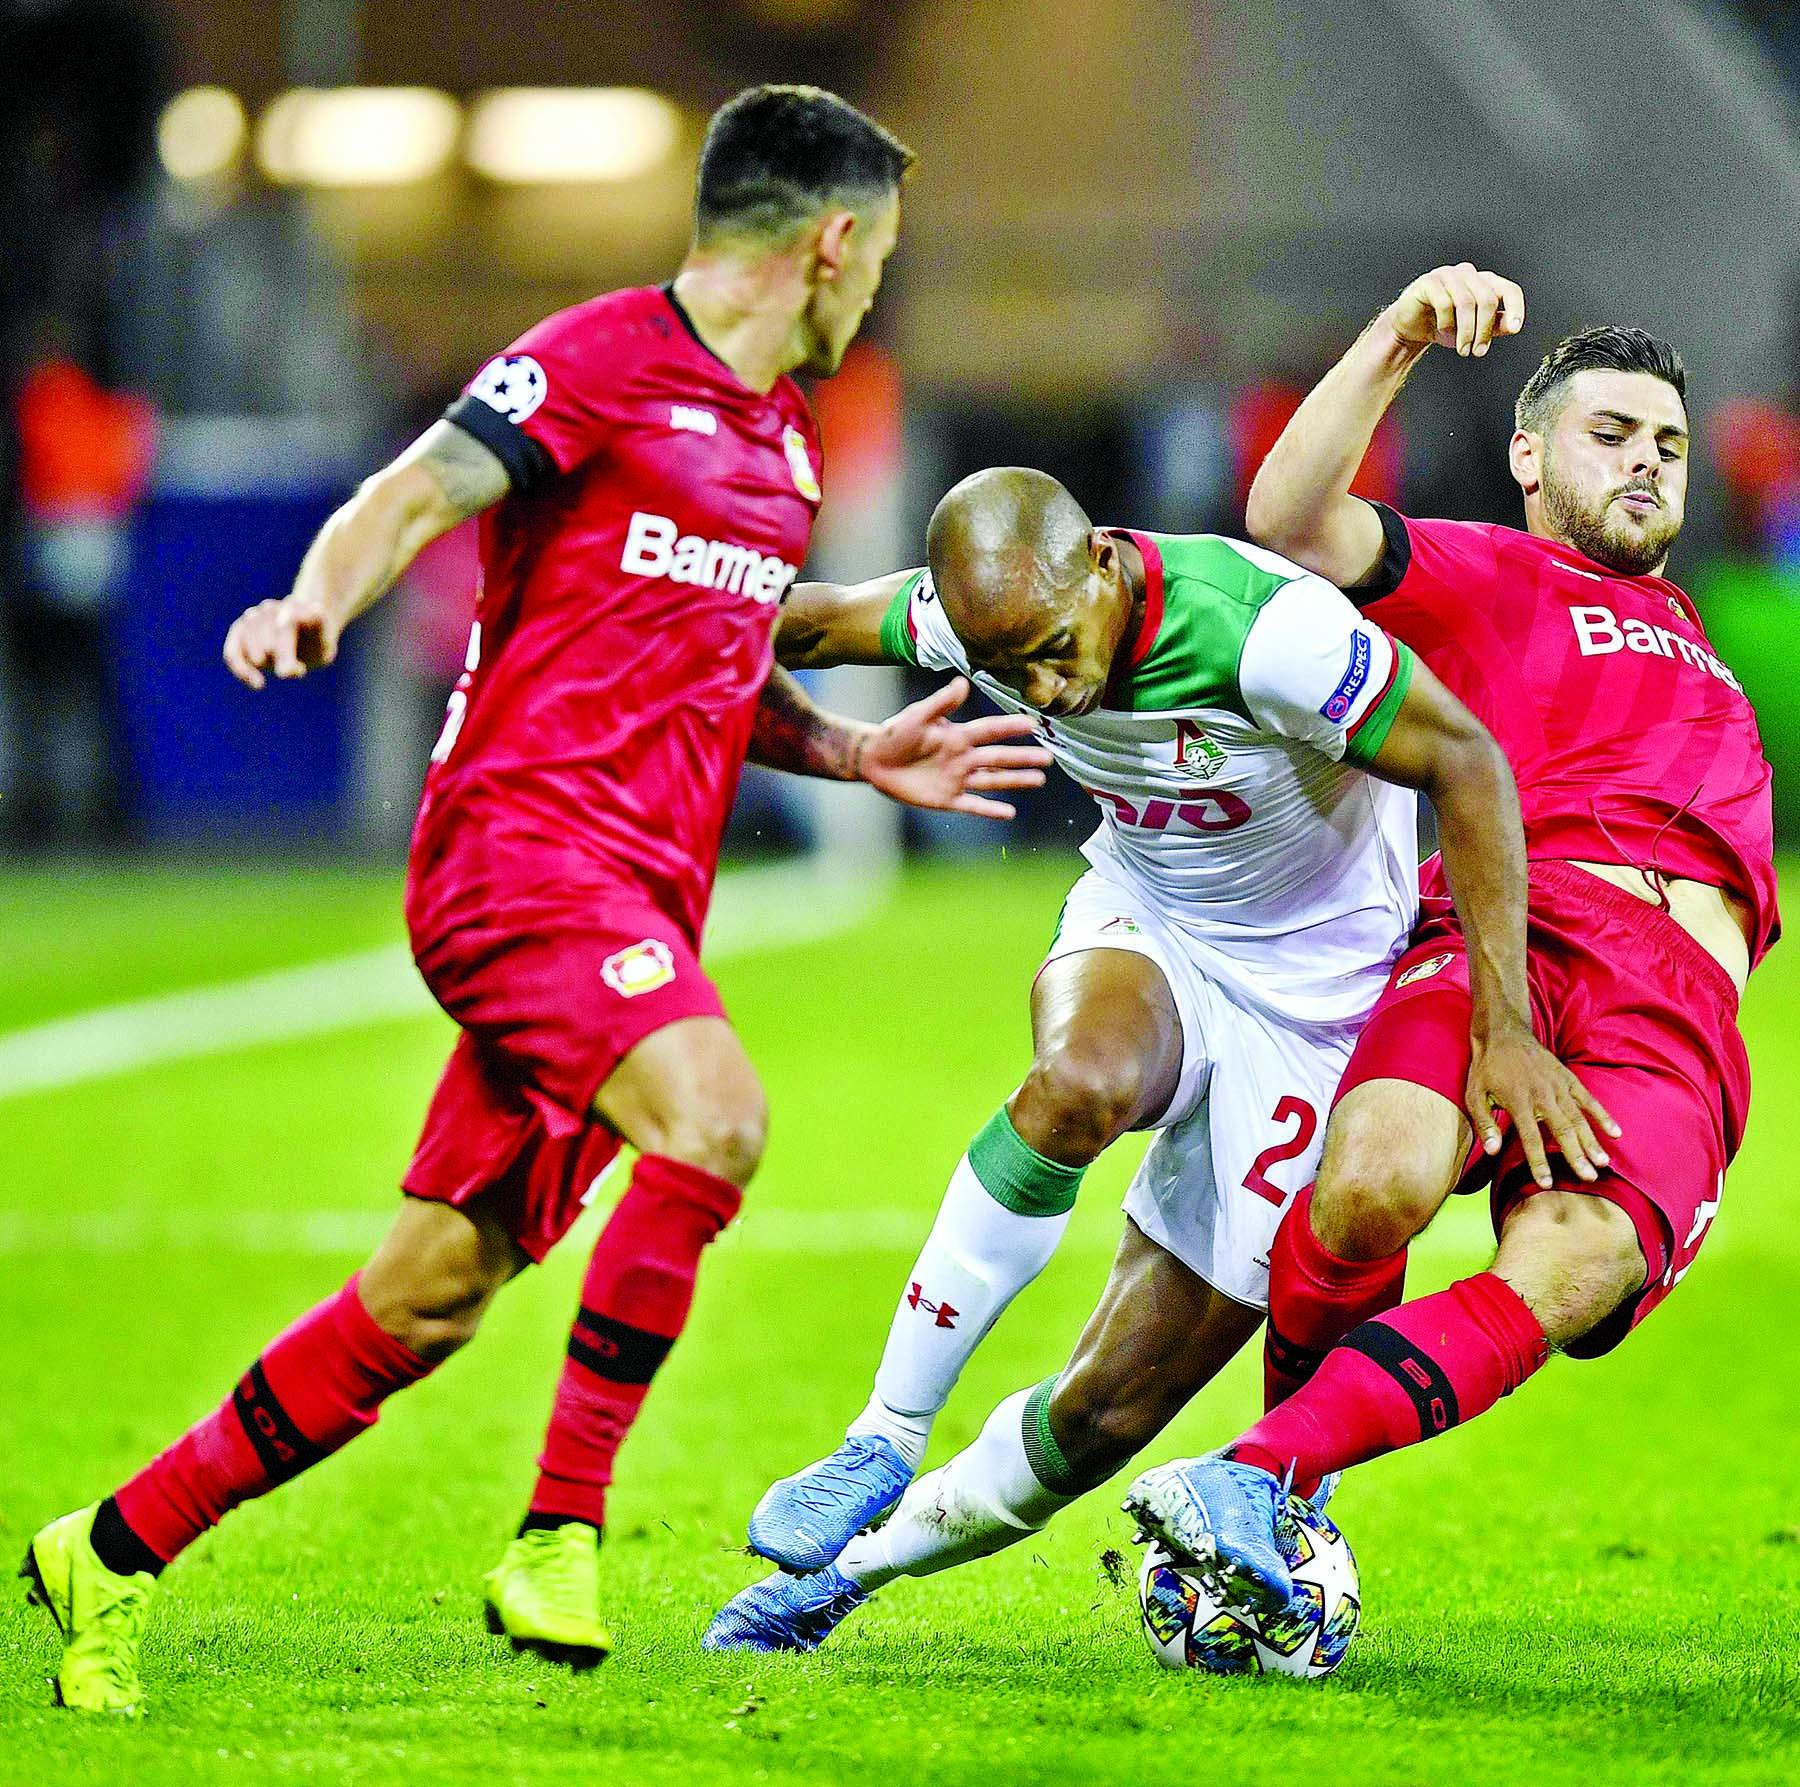 Lokomotiv beat Leverkusen thanks to goalkeeper's error